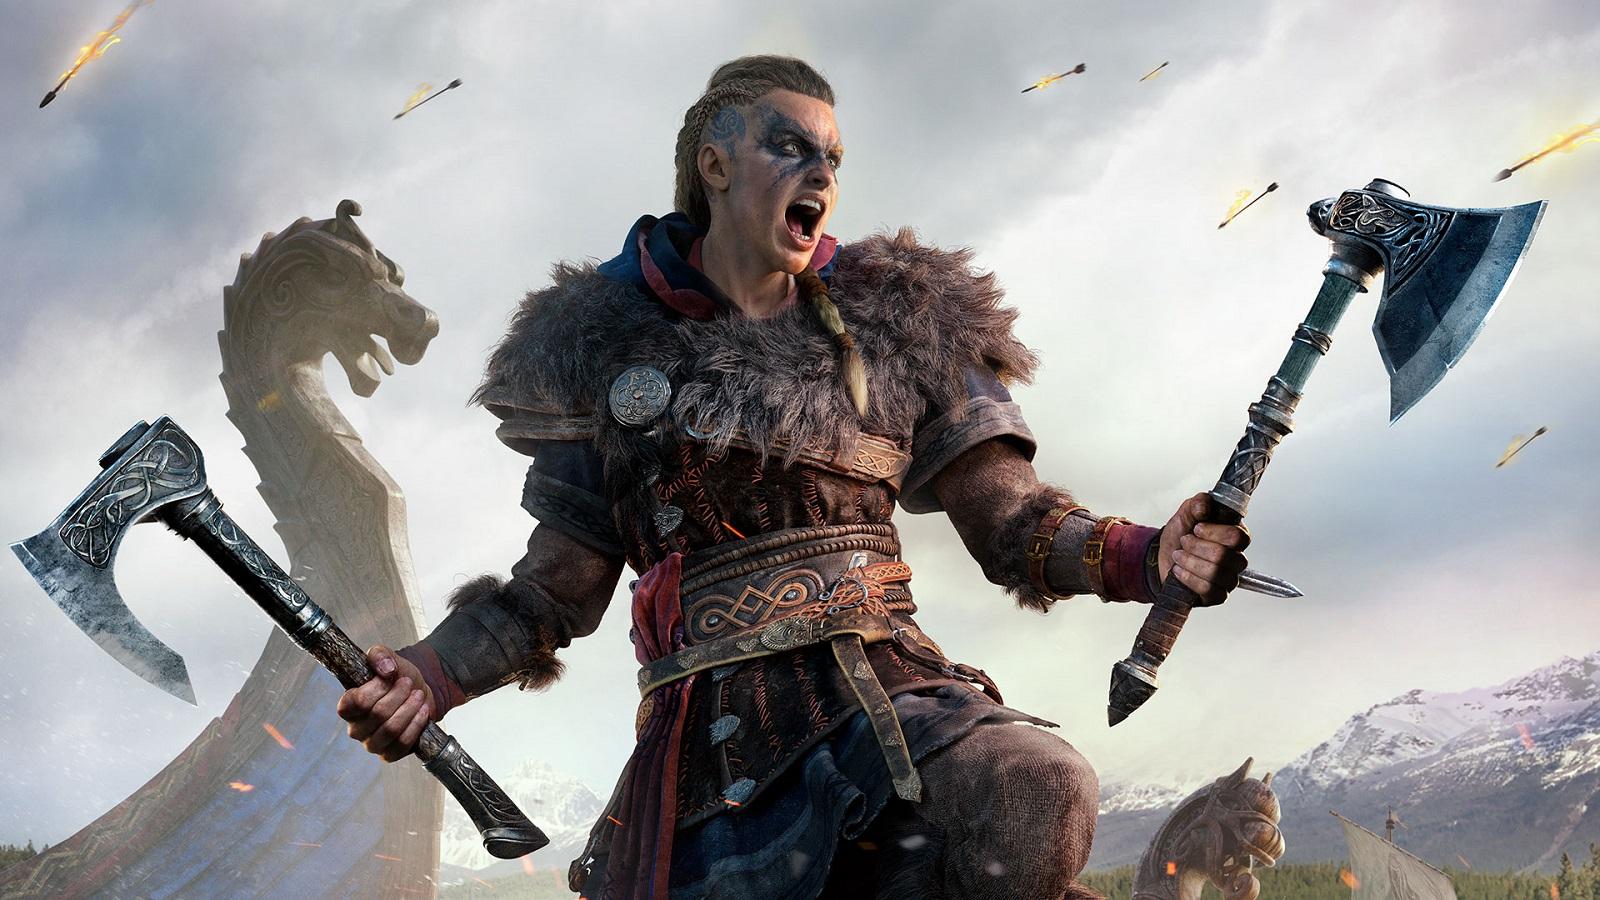 Асгард и Йотунхейм на новых скриншотах Assassin's Creed Valhalla